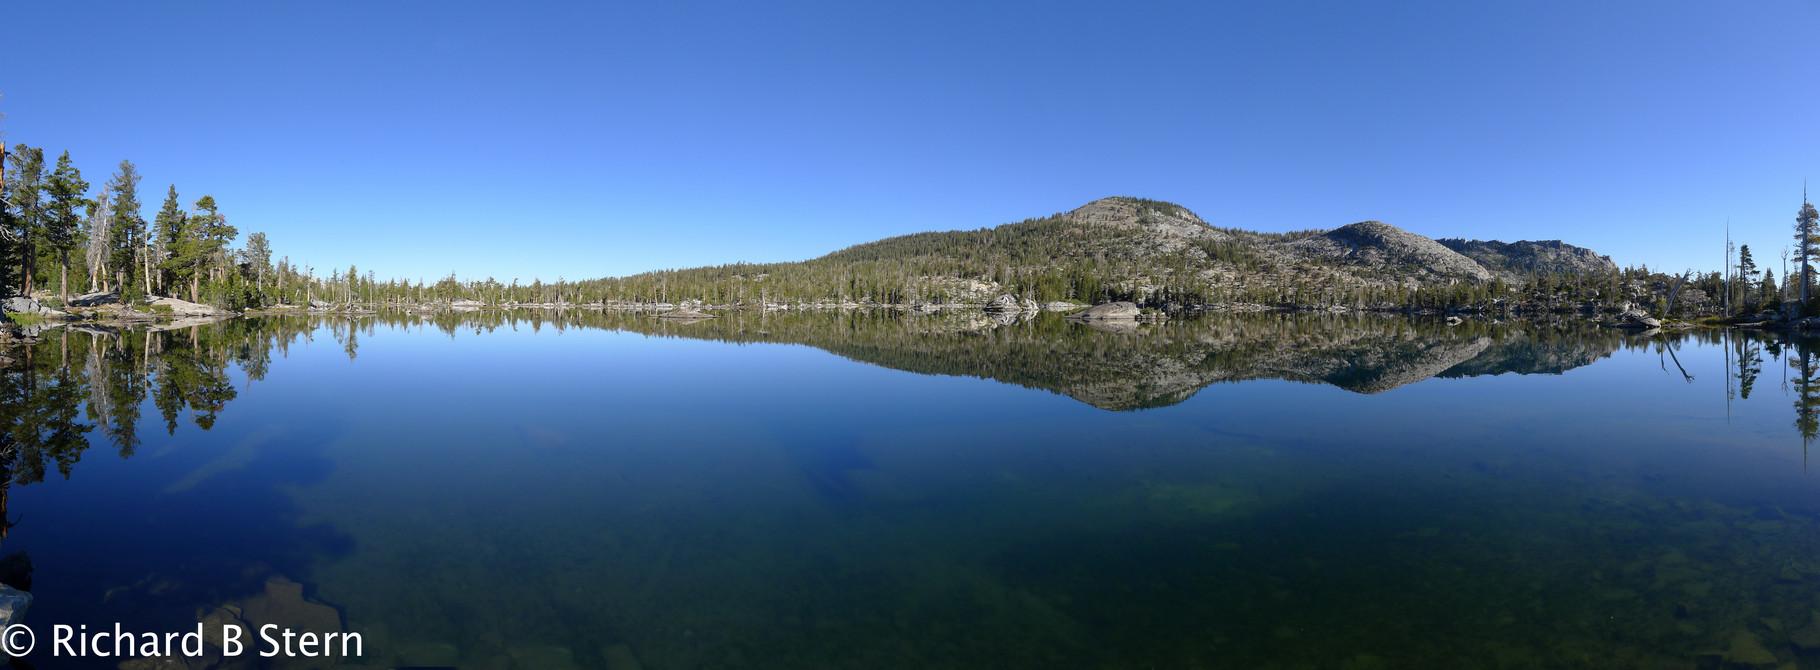 Middle Velma Lake-Desolation Wilderness Area